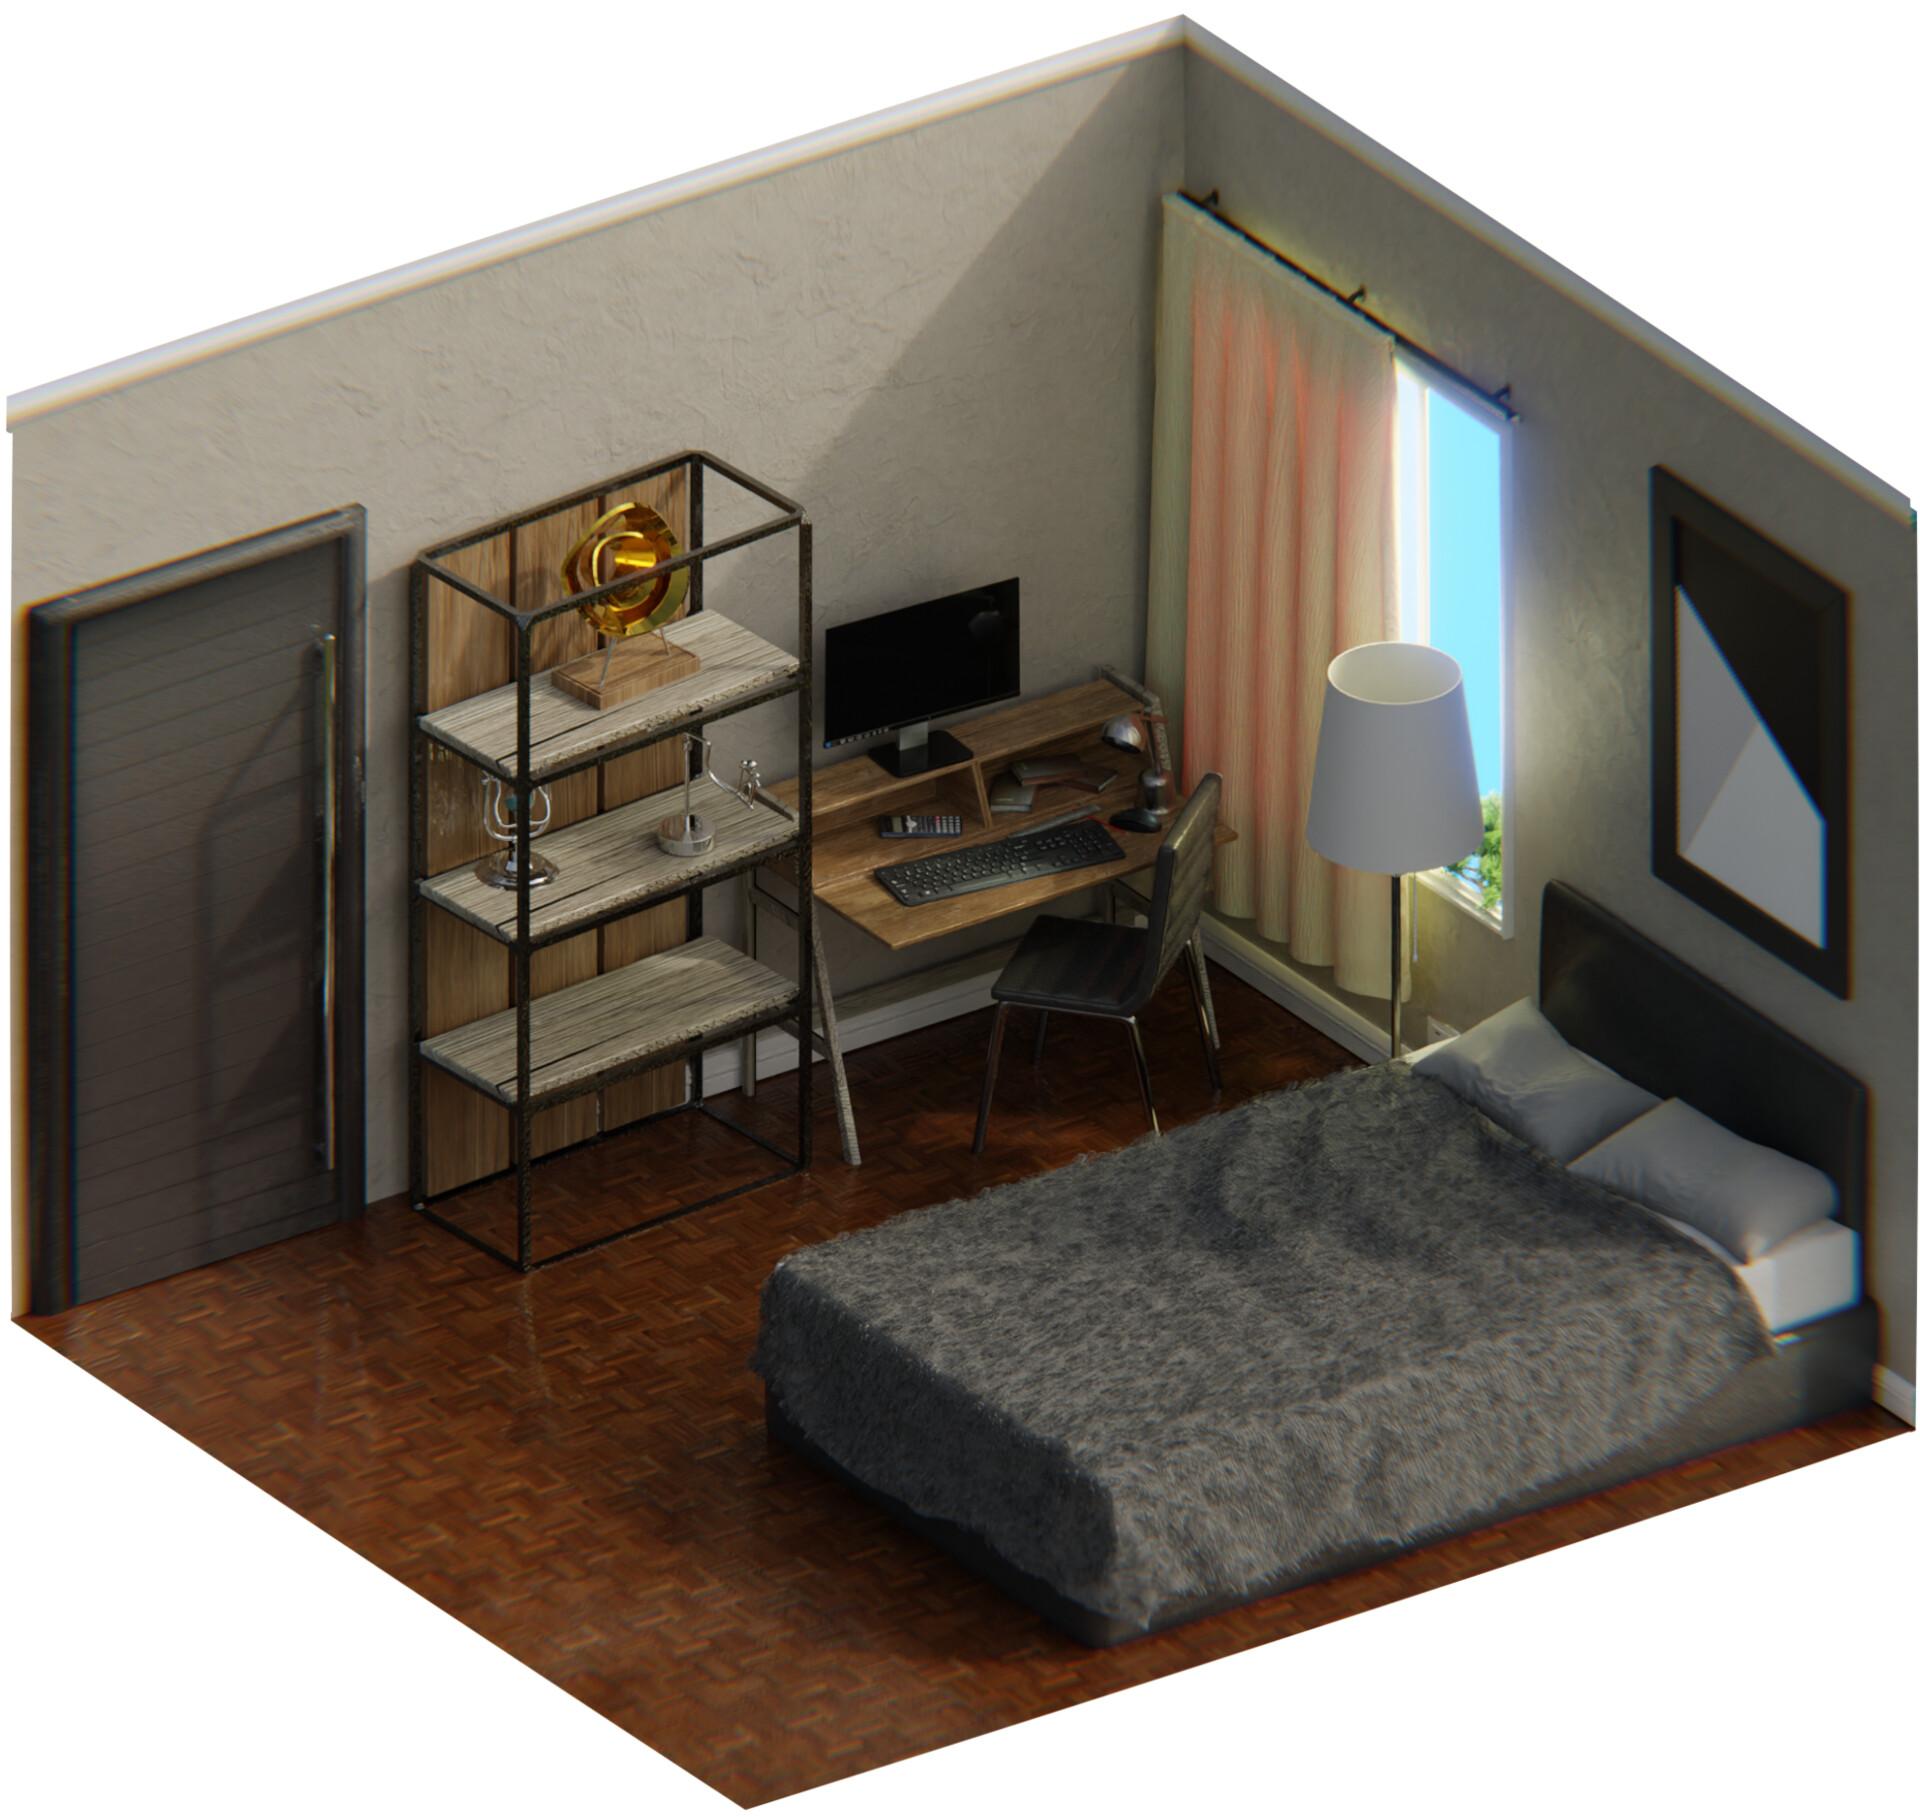 Artstation Isometric Bedroom Henry Law